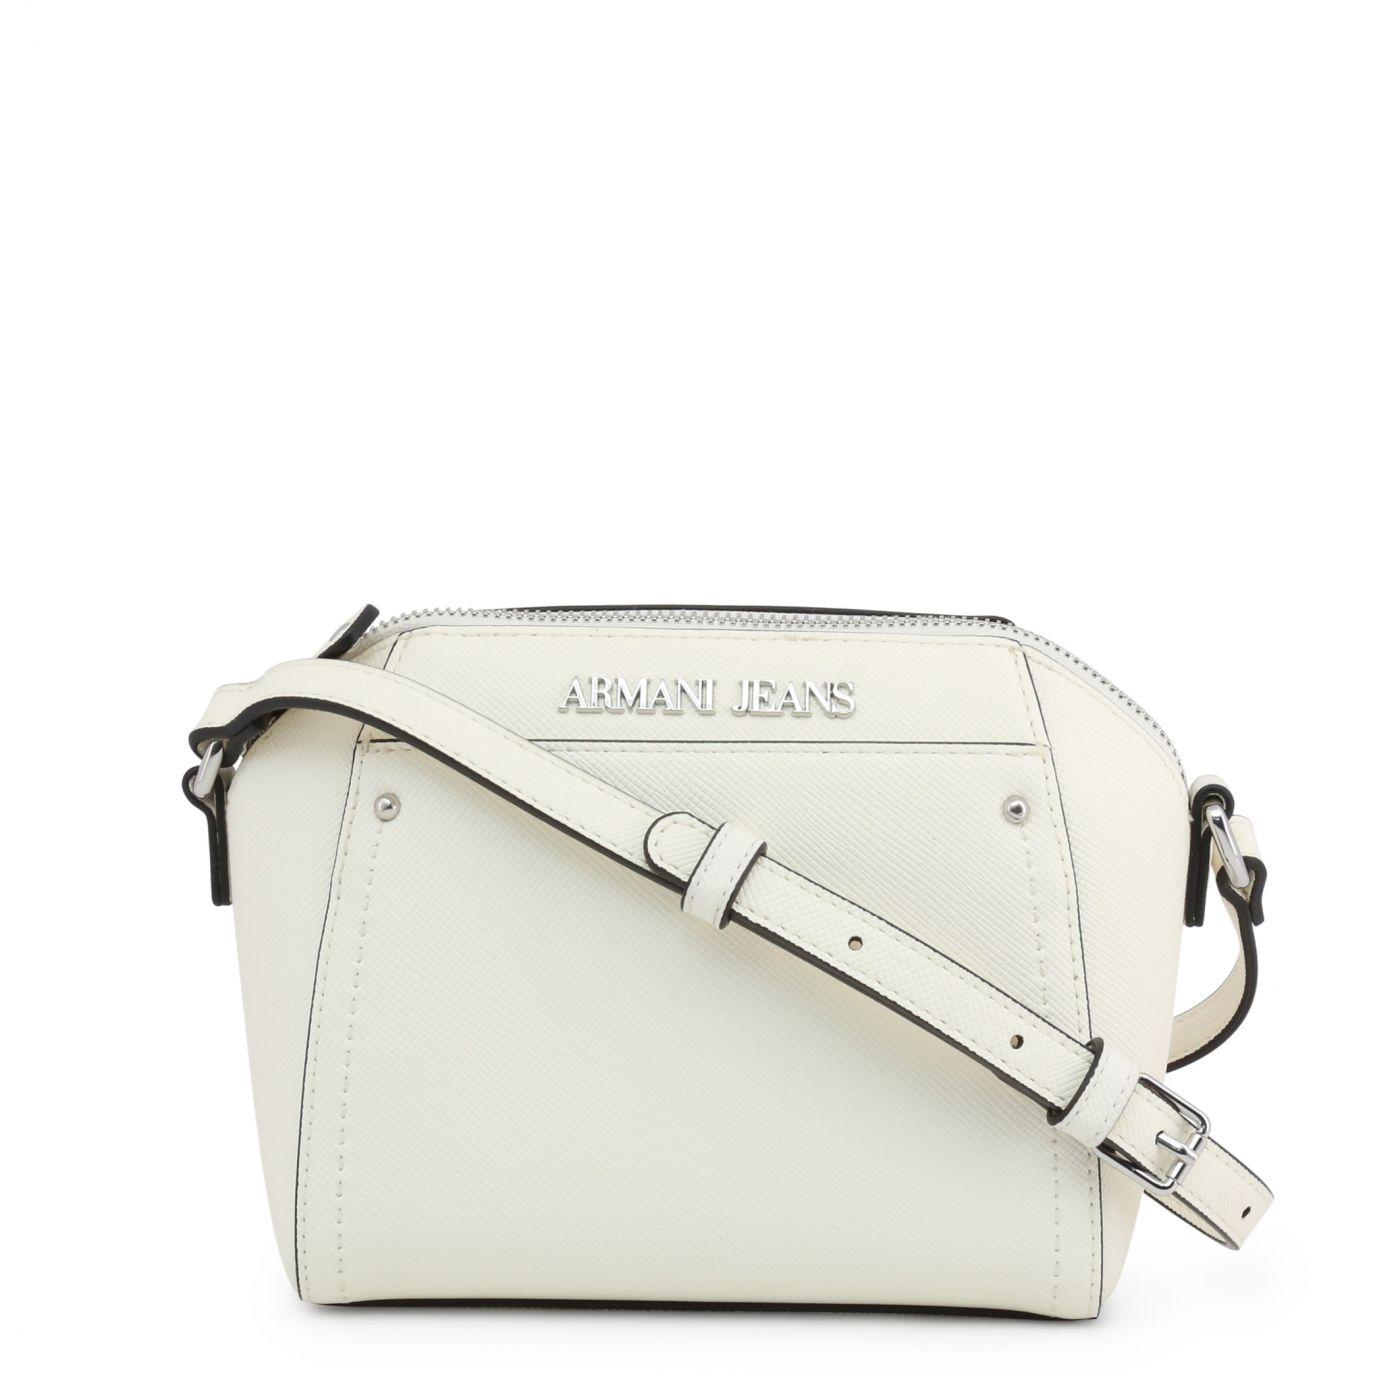 Armani Jeans 922170_7P75